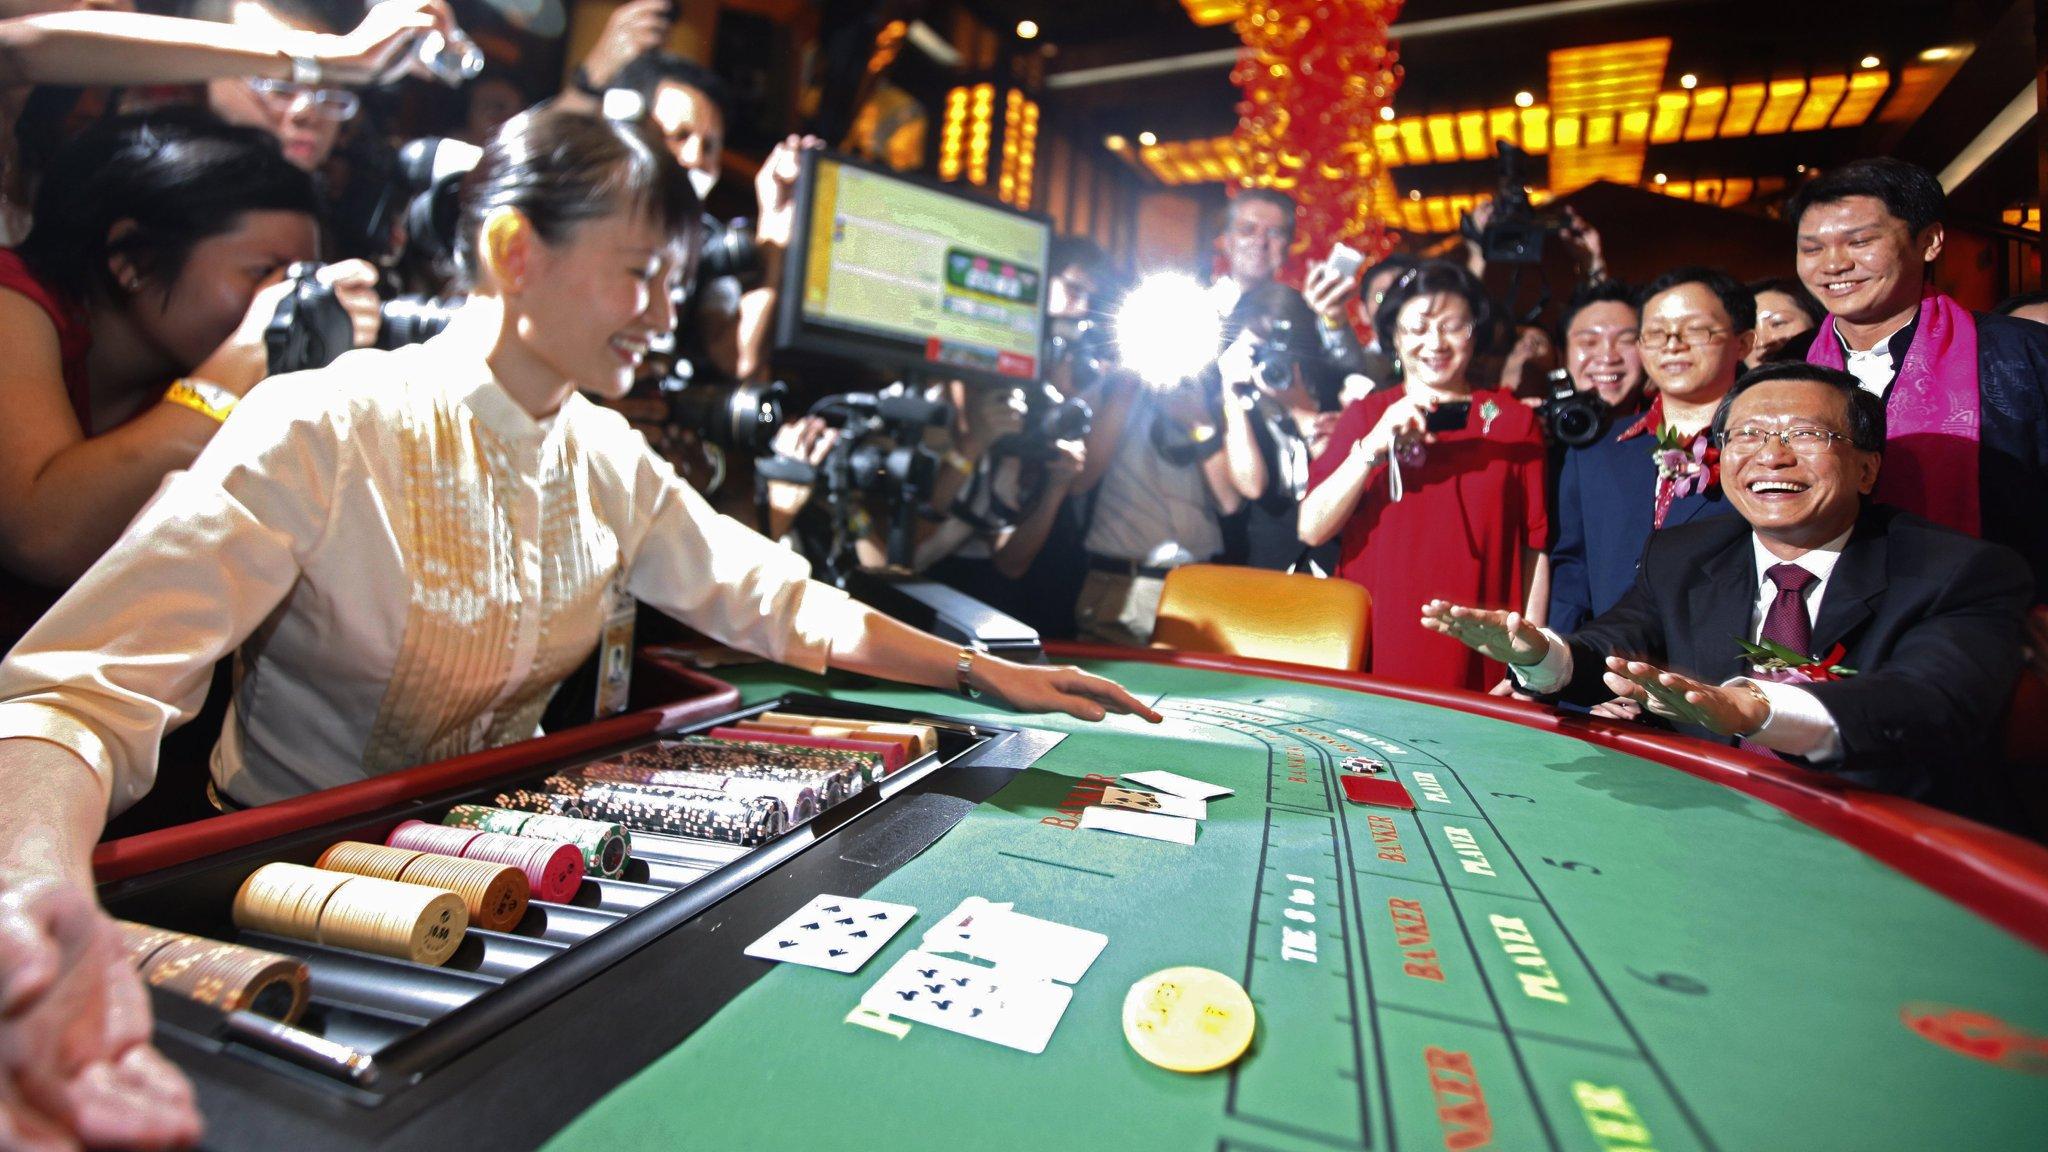 earched a legal gambling platform